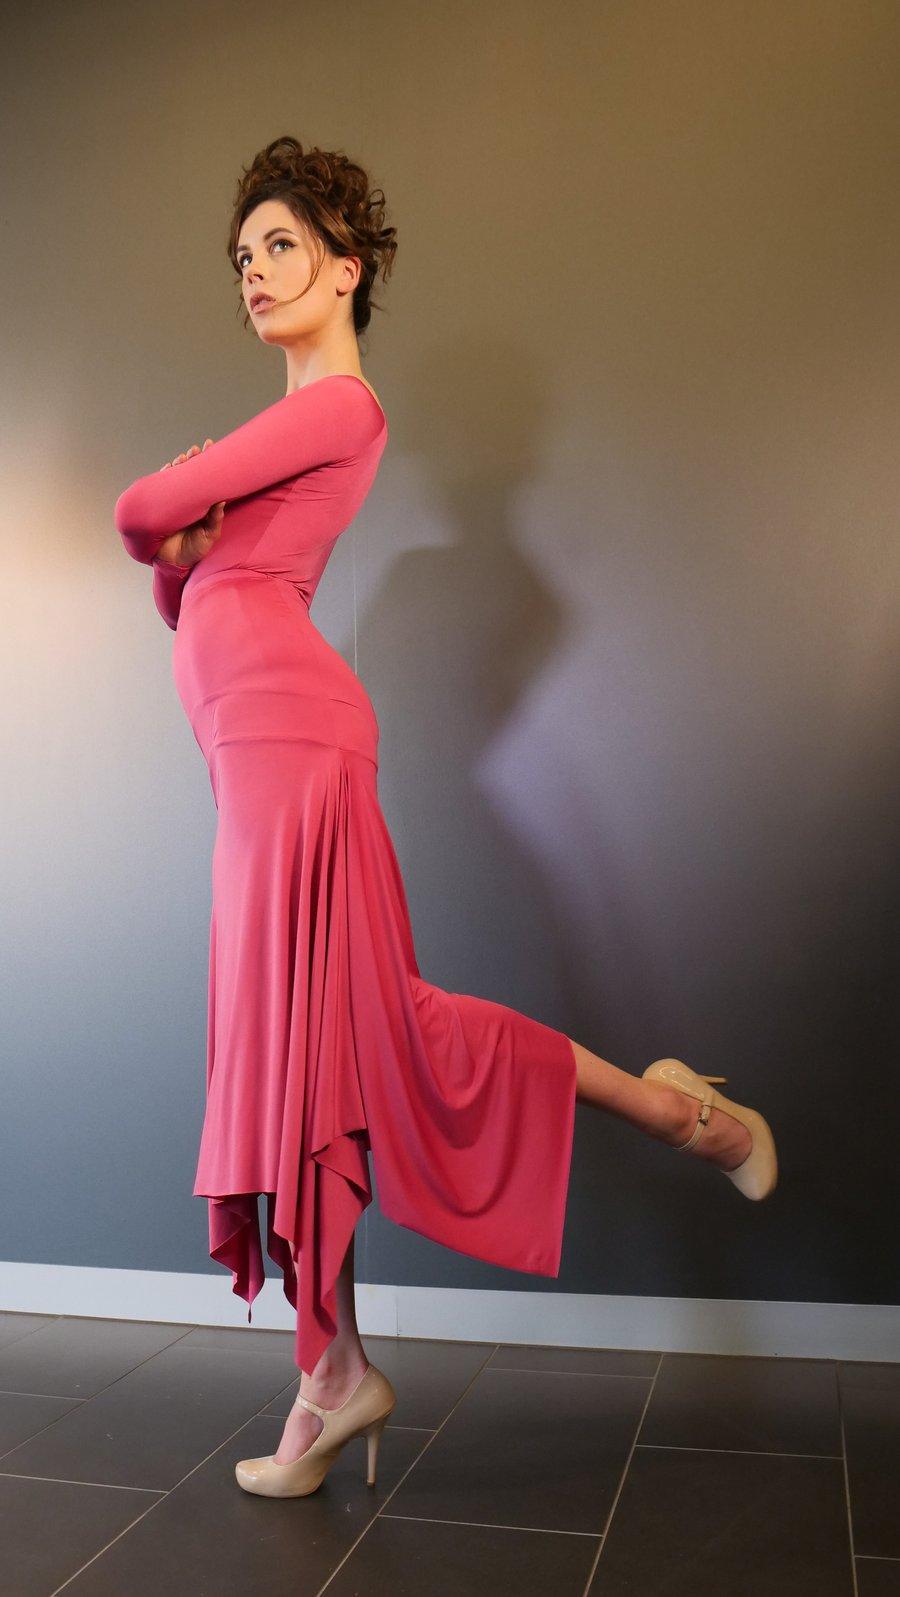 Image of Barcelona Skirt - Fuchsia J3346 Dancewear latin ballroom